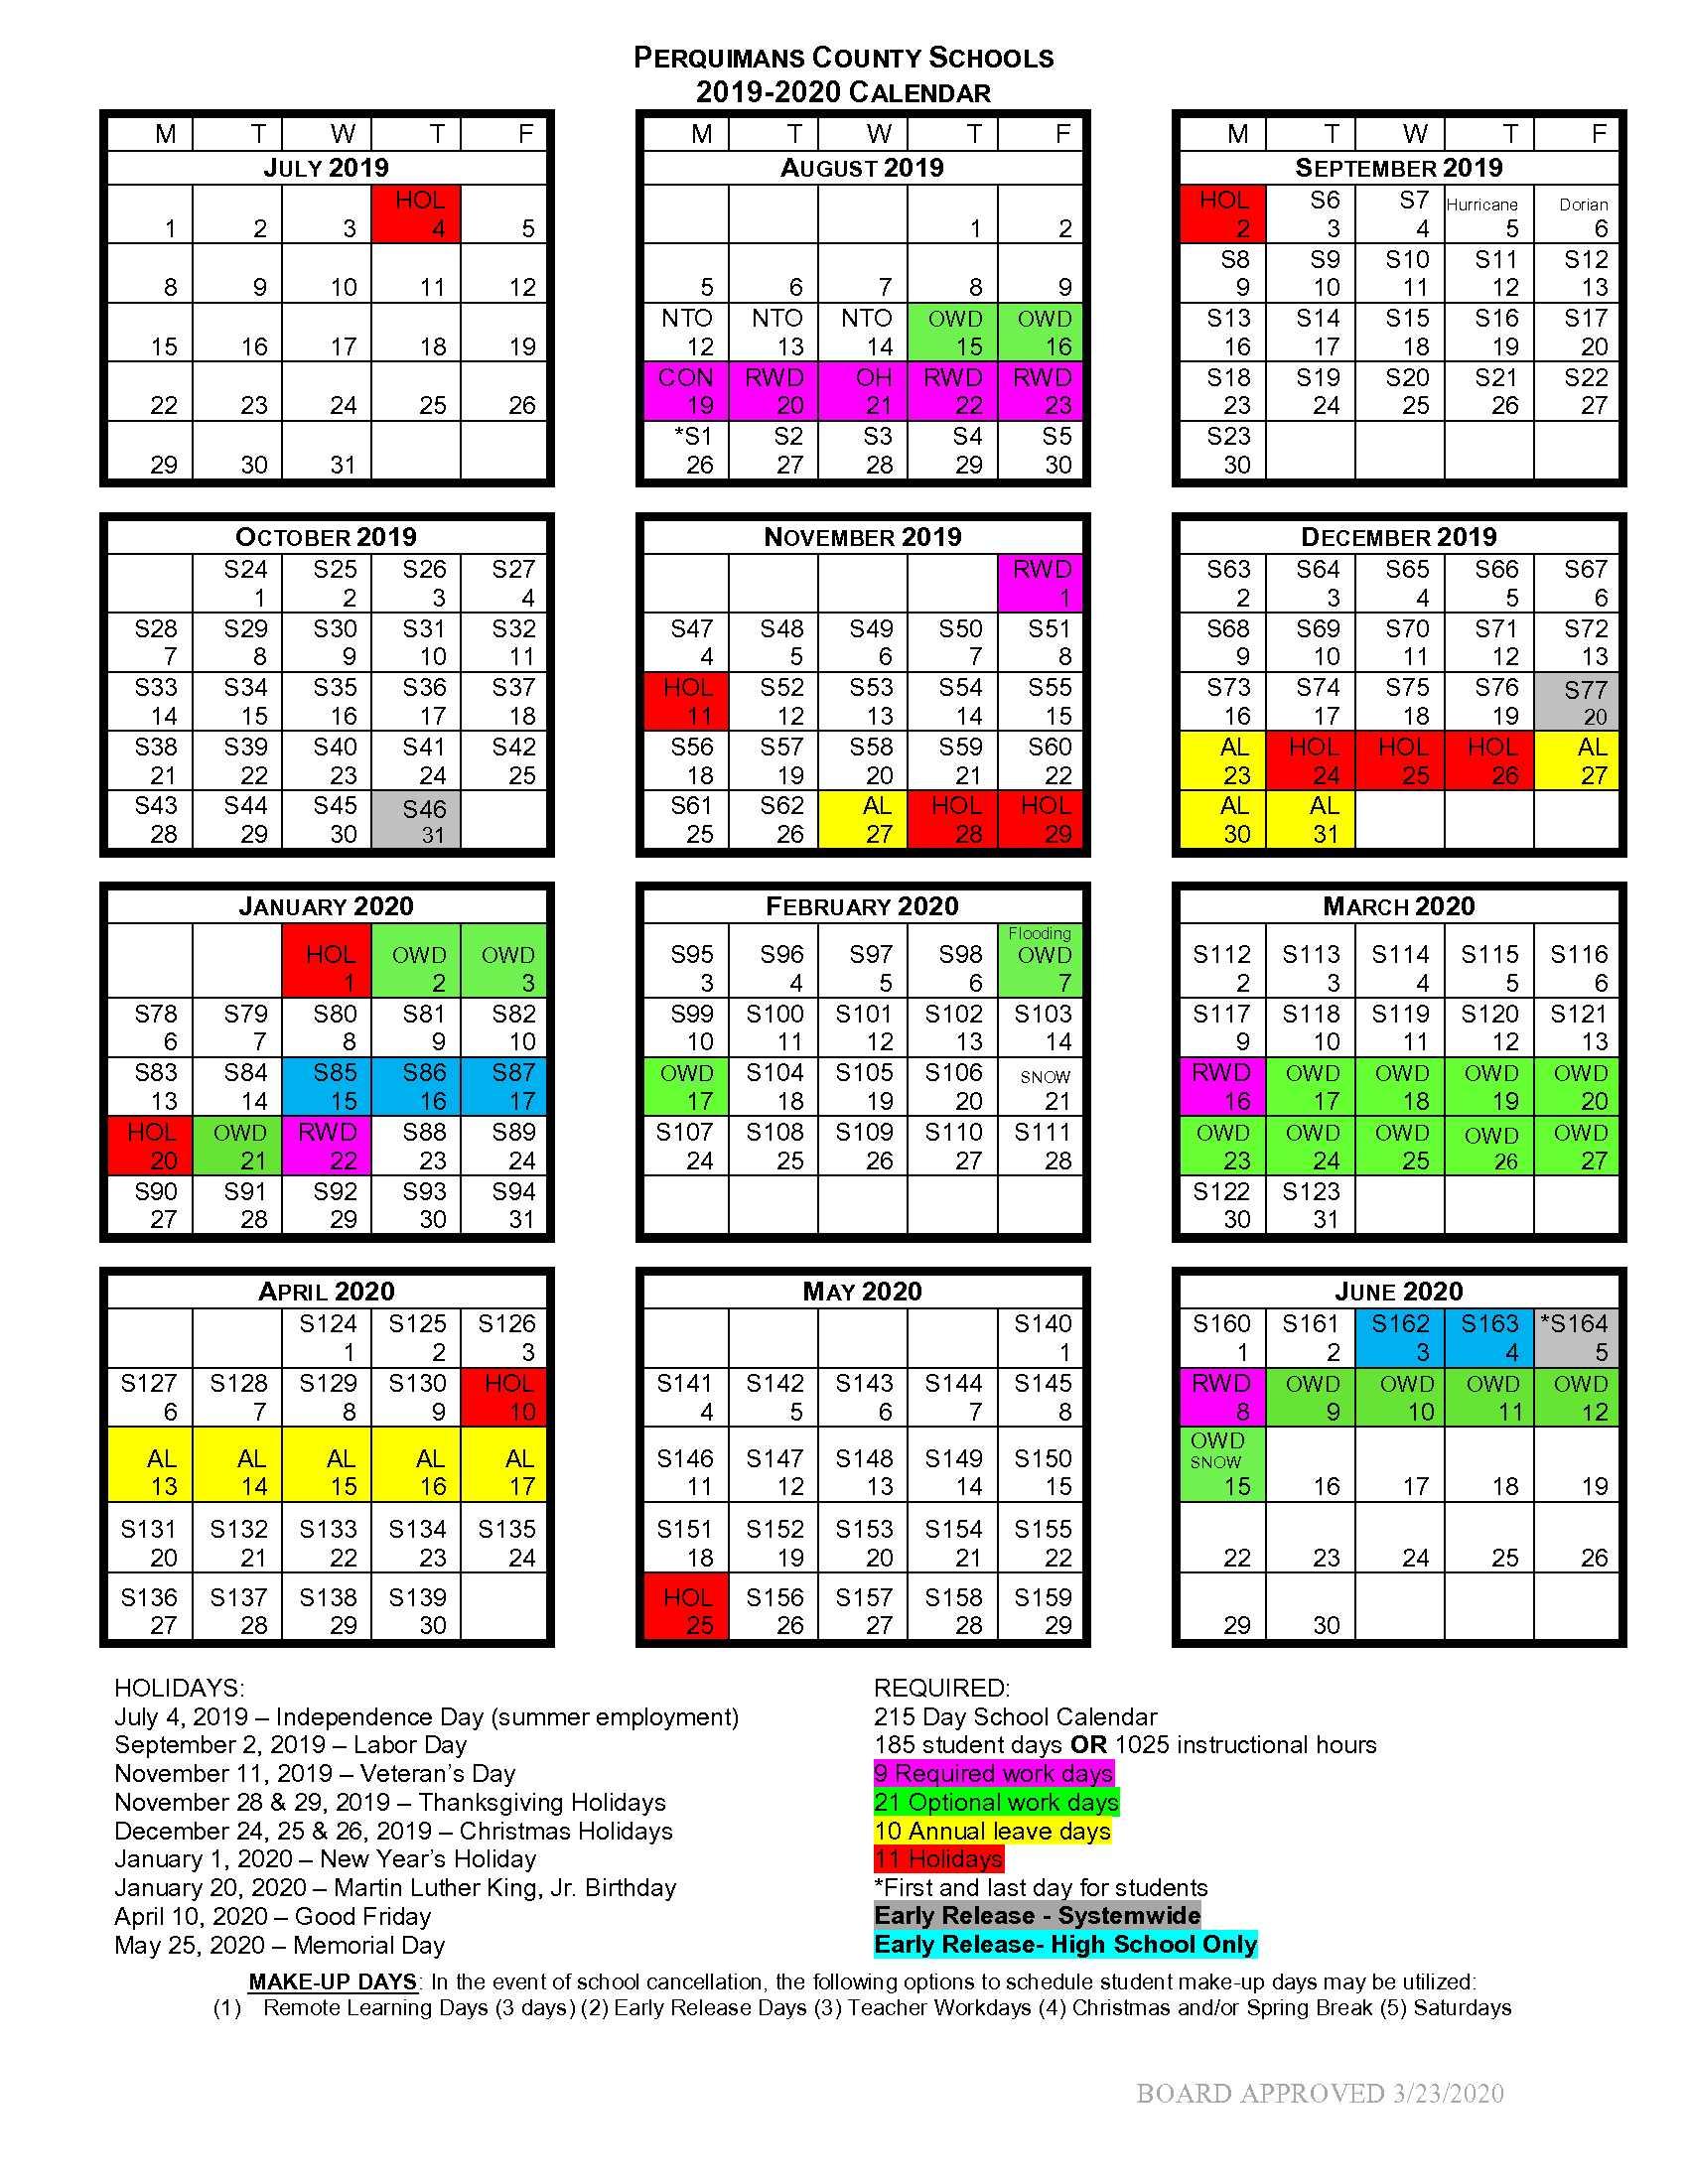 School Calendar 2020-2021 - Perquimans School District throughout Board Of Education Calendar 2021 2020 Bibb County